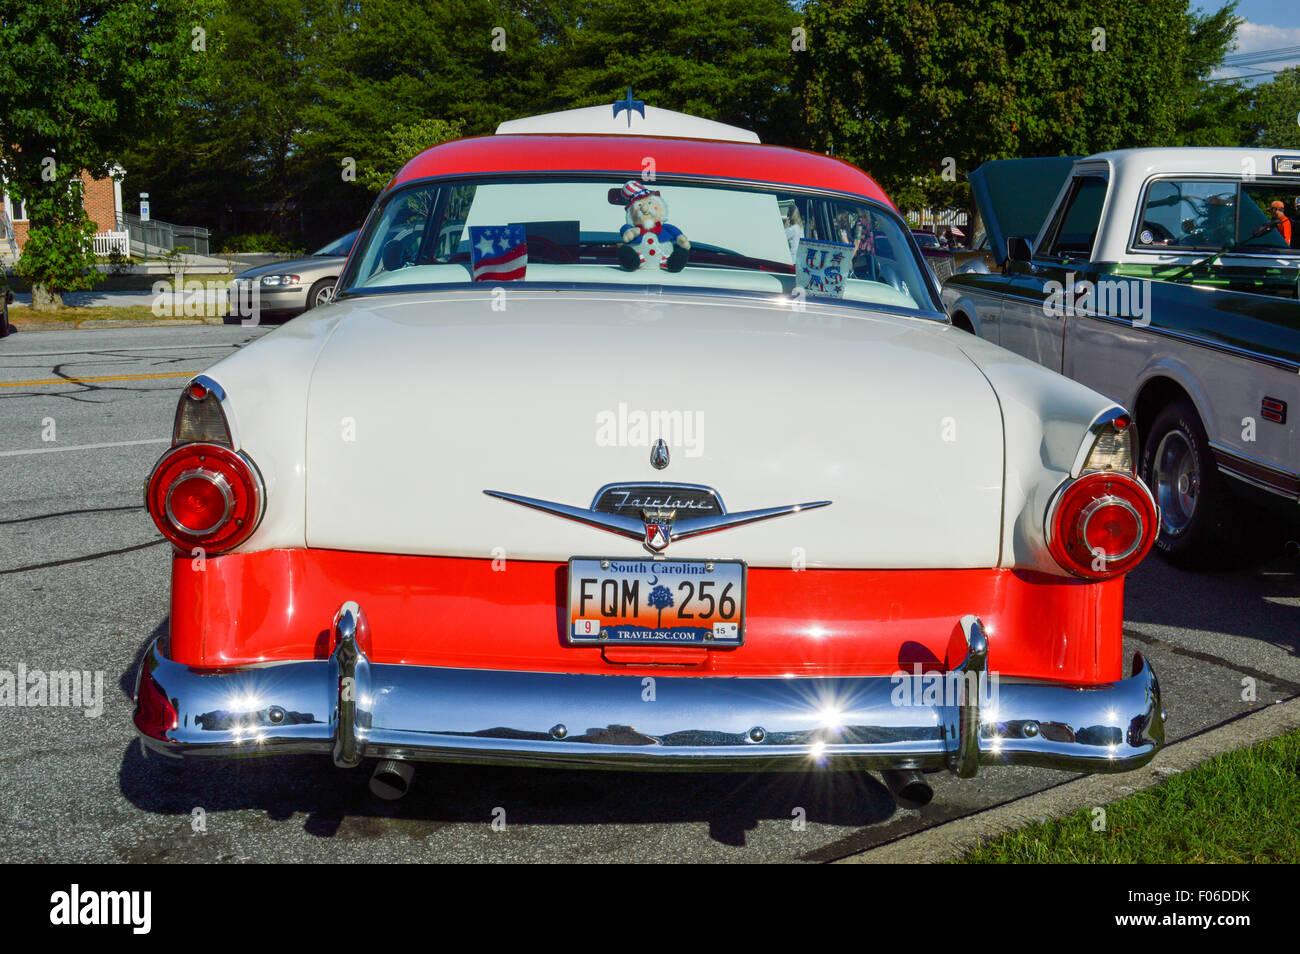 A 1956 Ford Fairlane Victoria Hard Top Car - Stock Image